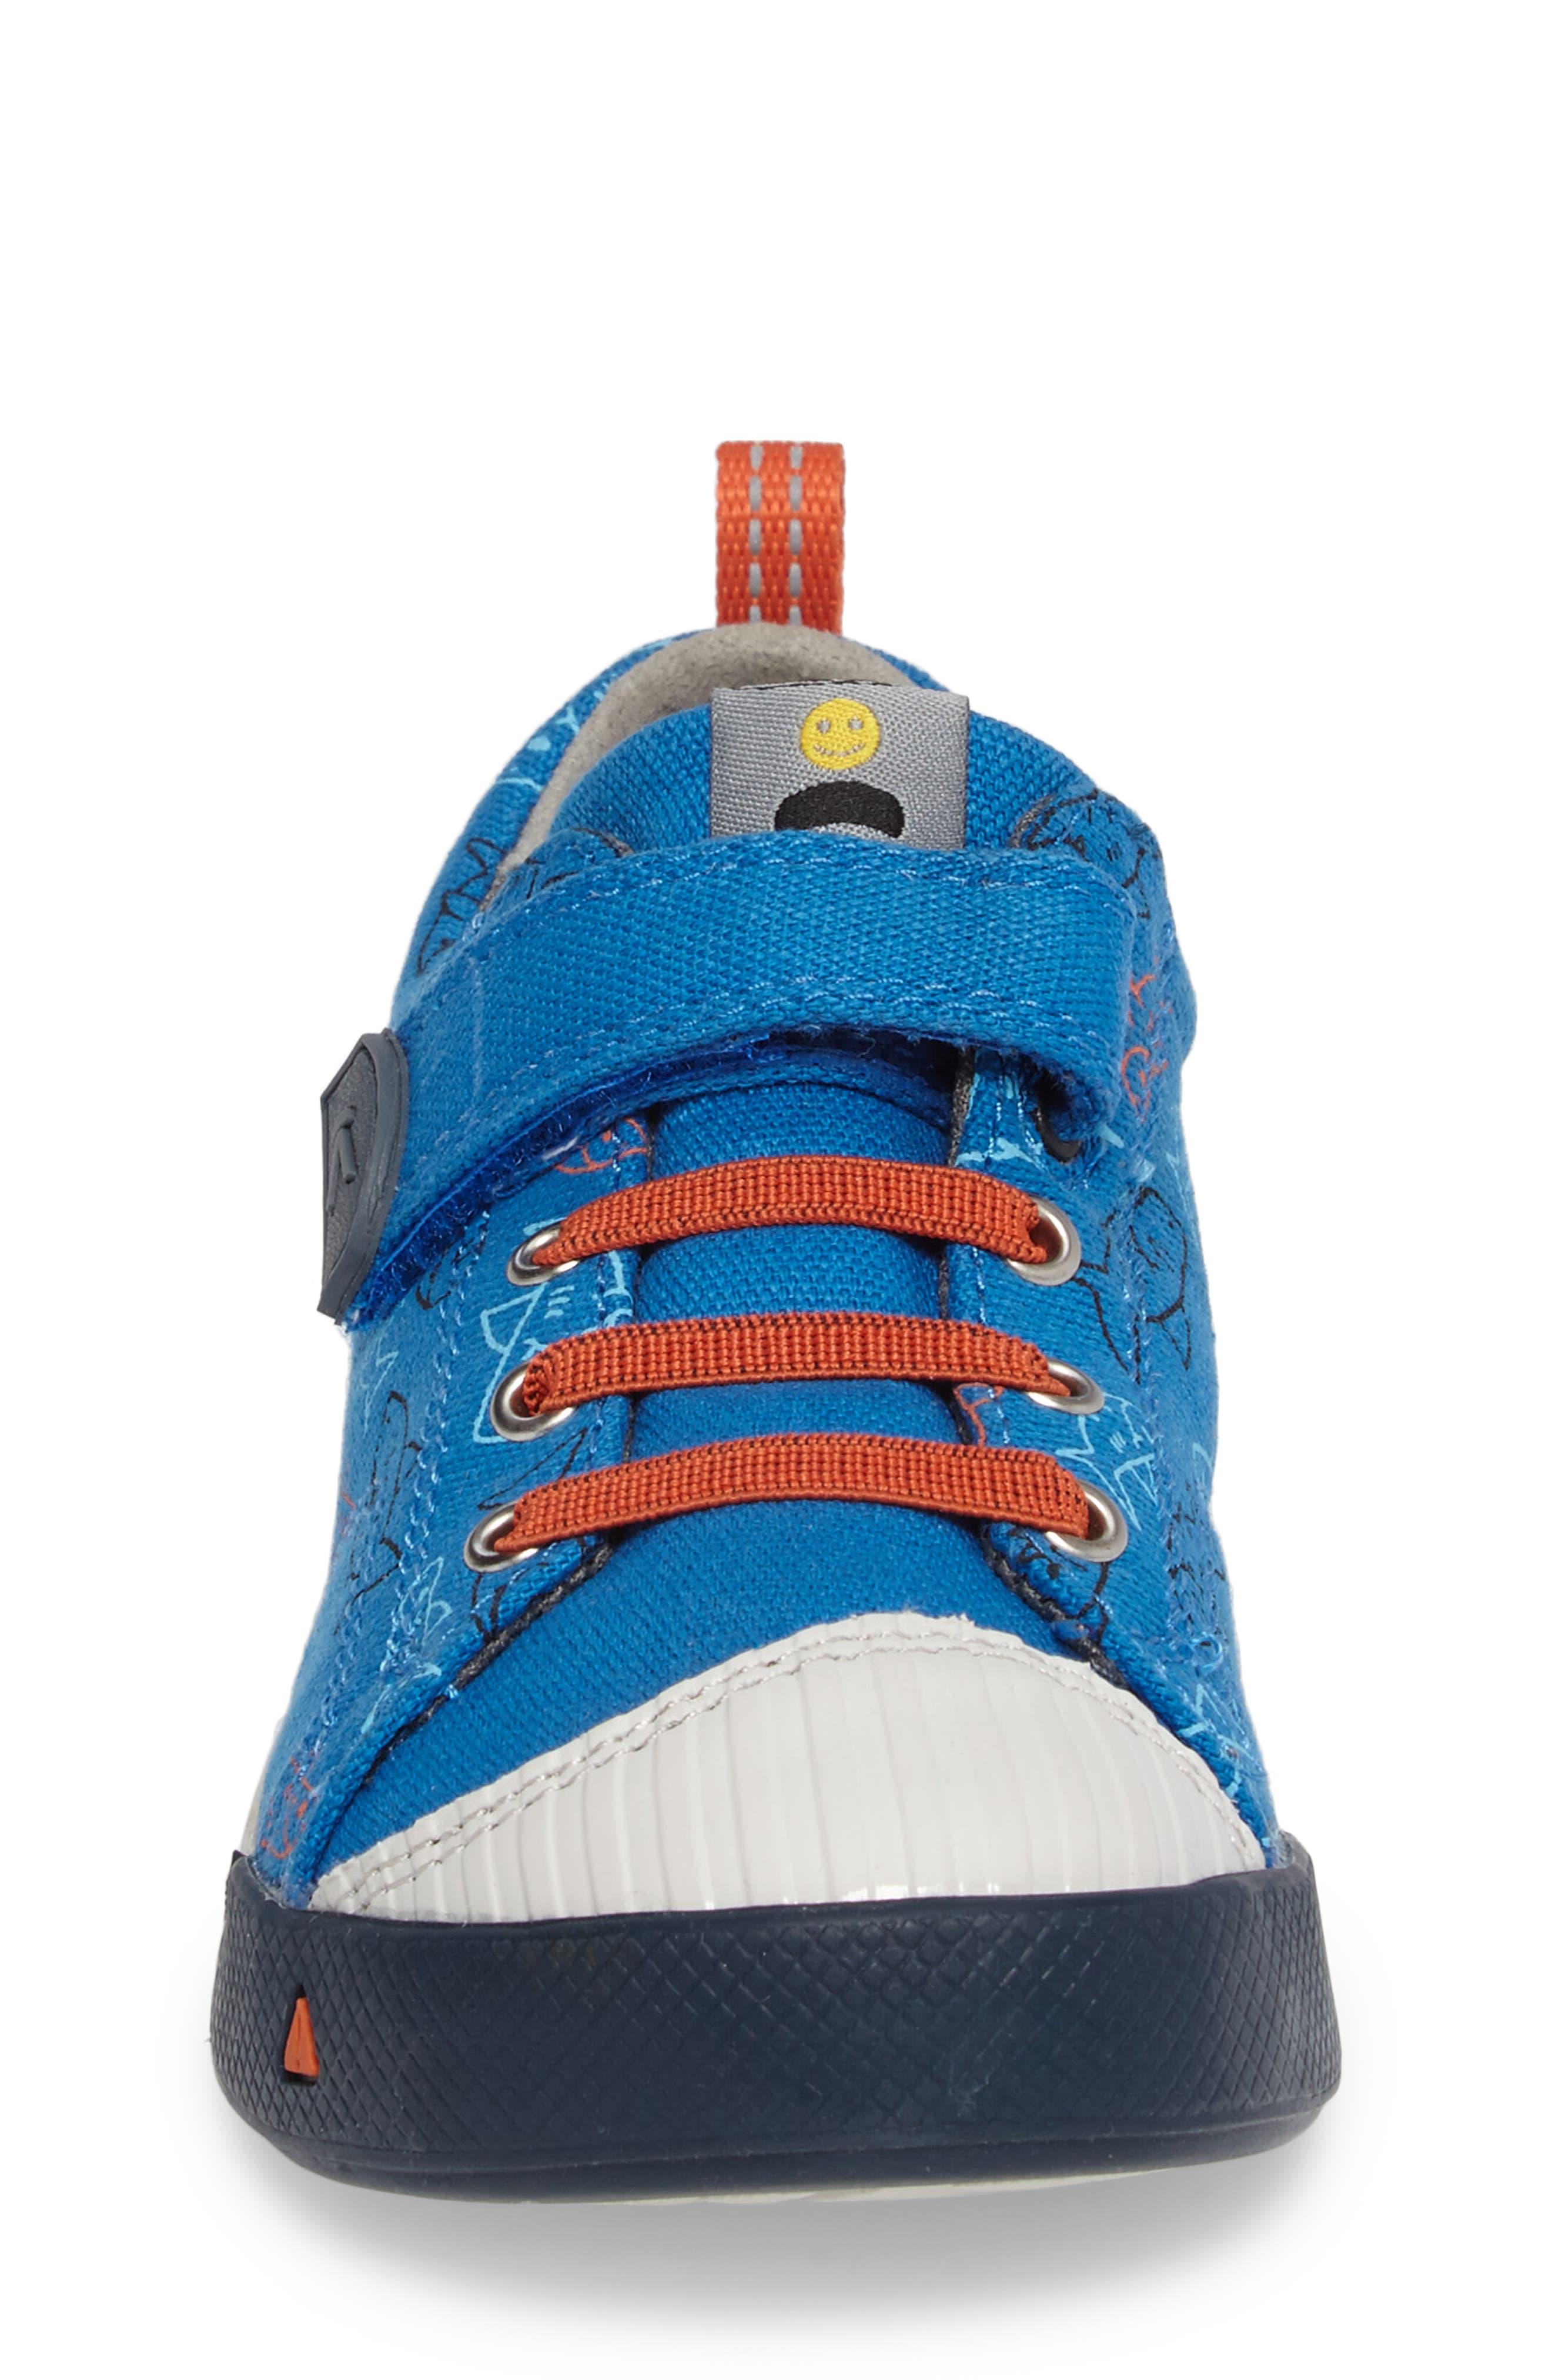 Encanto Finley Sneaker,                             Alternate thumbnail 4, color,                             402